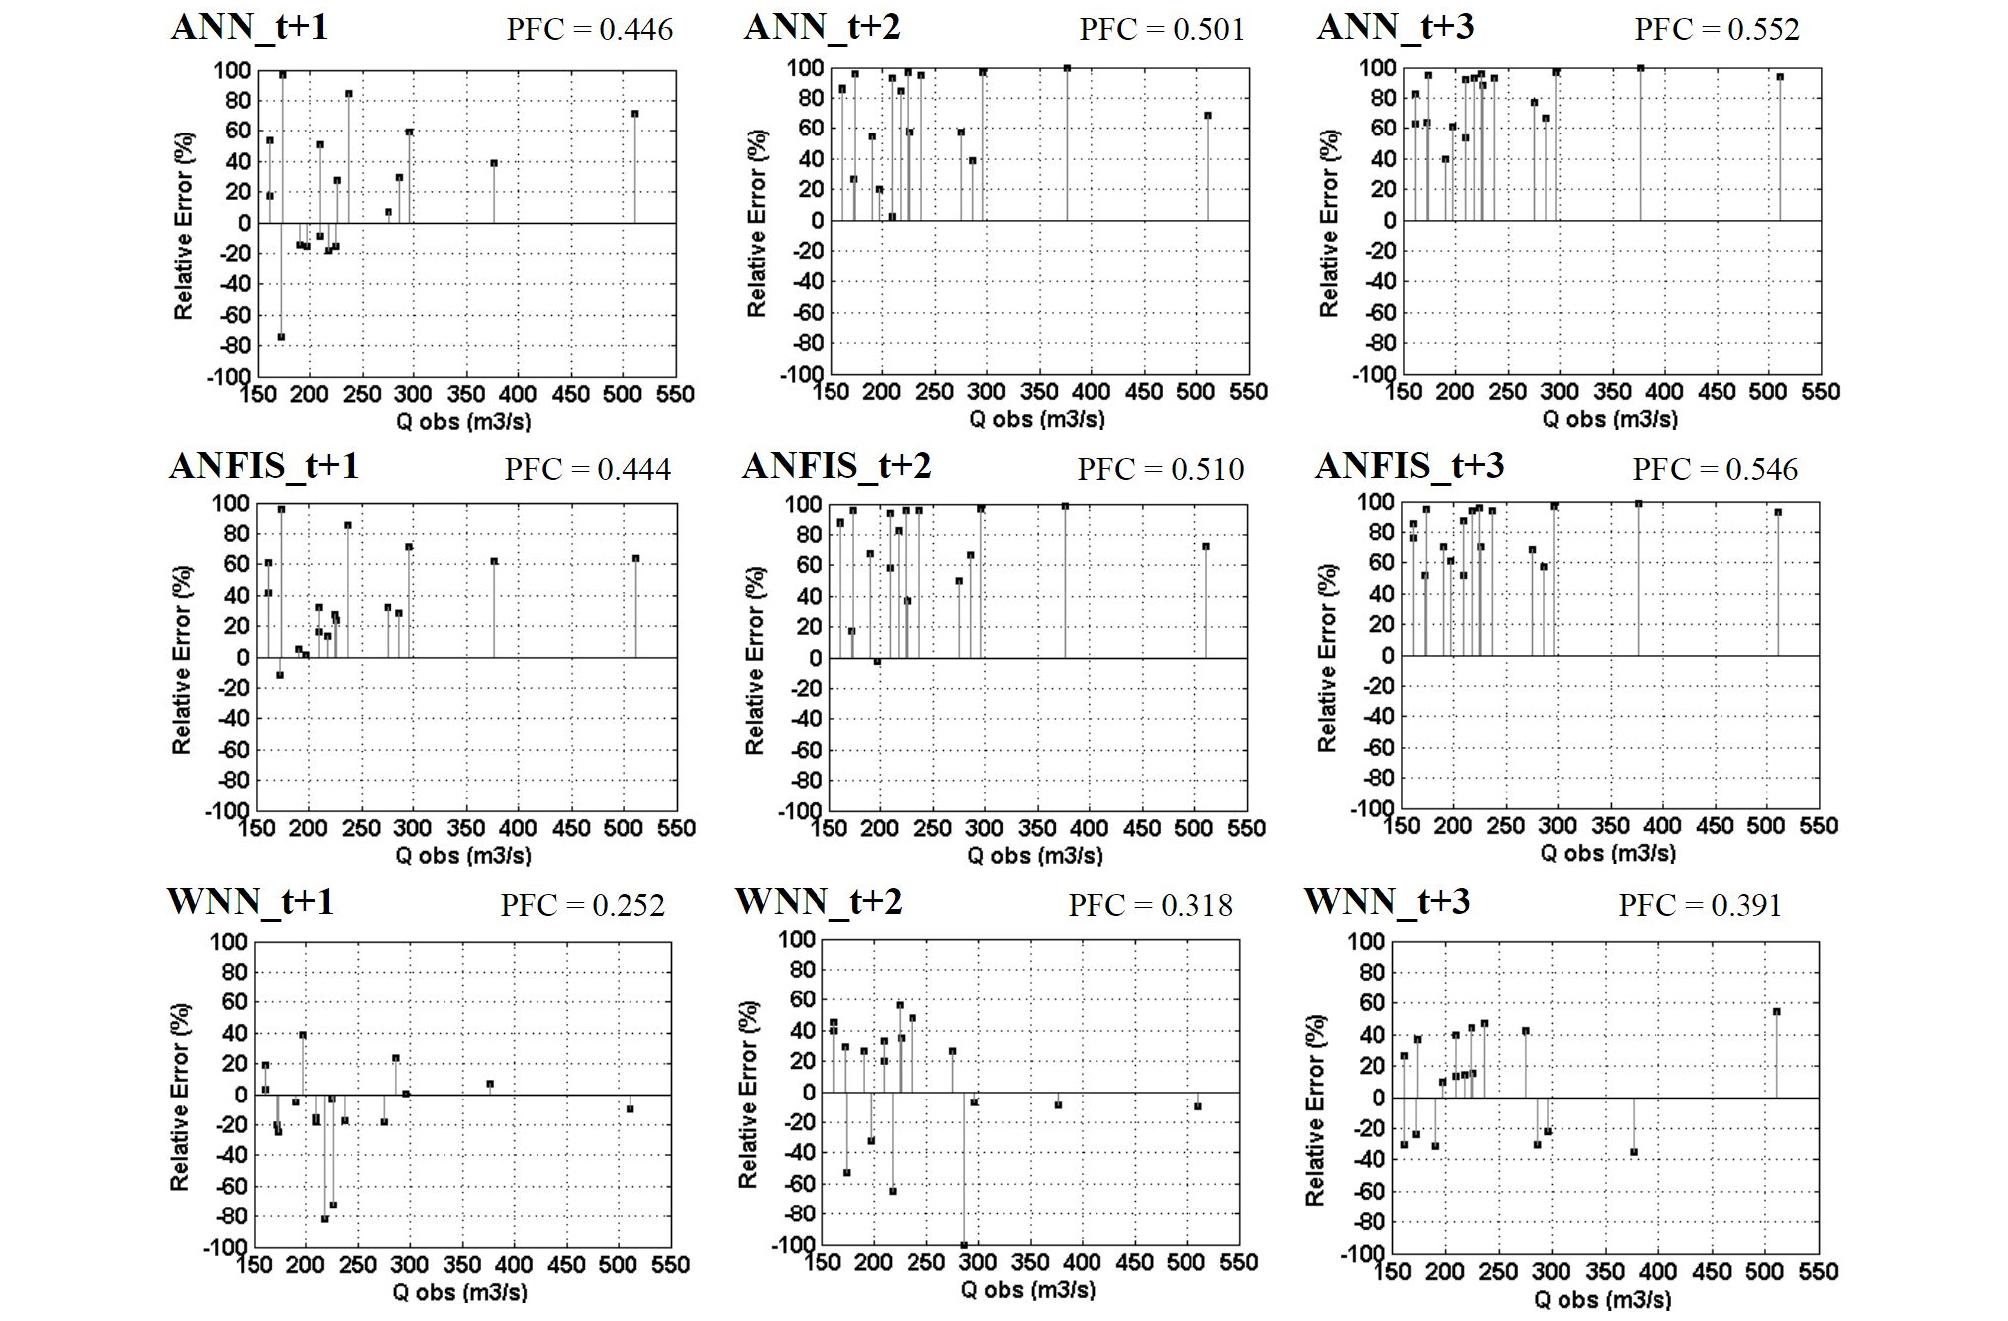 http://static.apub.kr/journalsite/sites/kwra/2020-053-06/N0200530601/images/kwra_53_06_01_F11.jpg